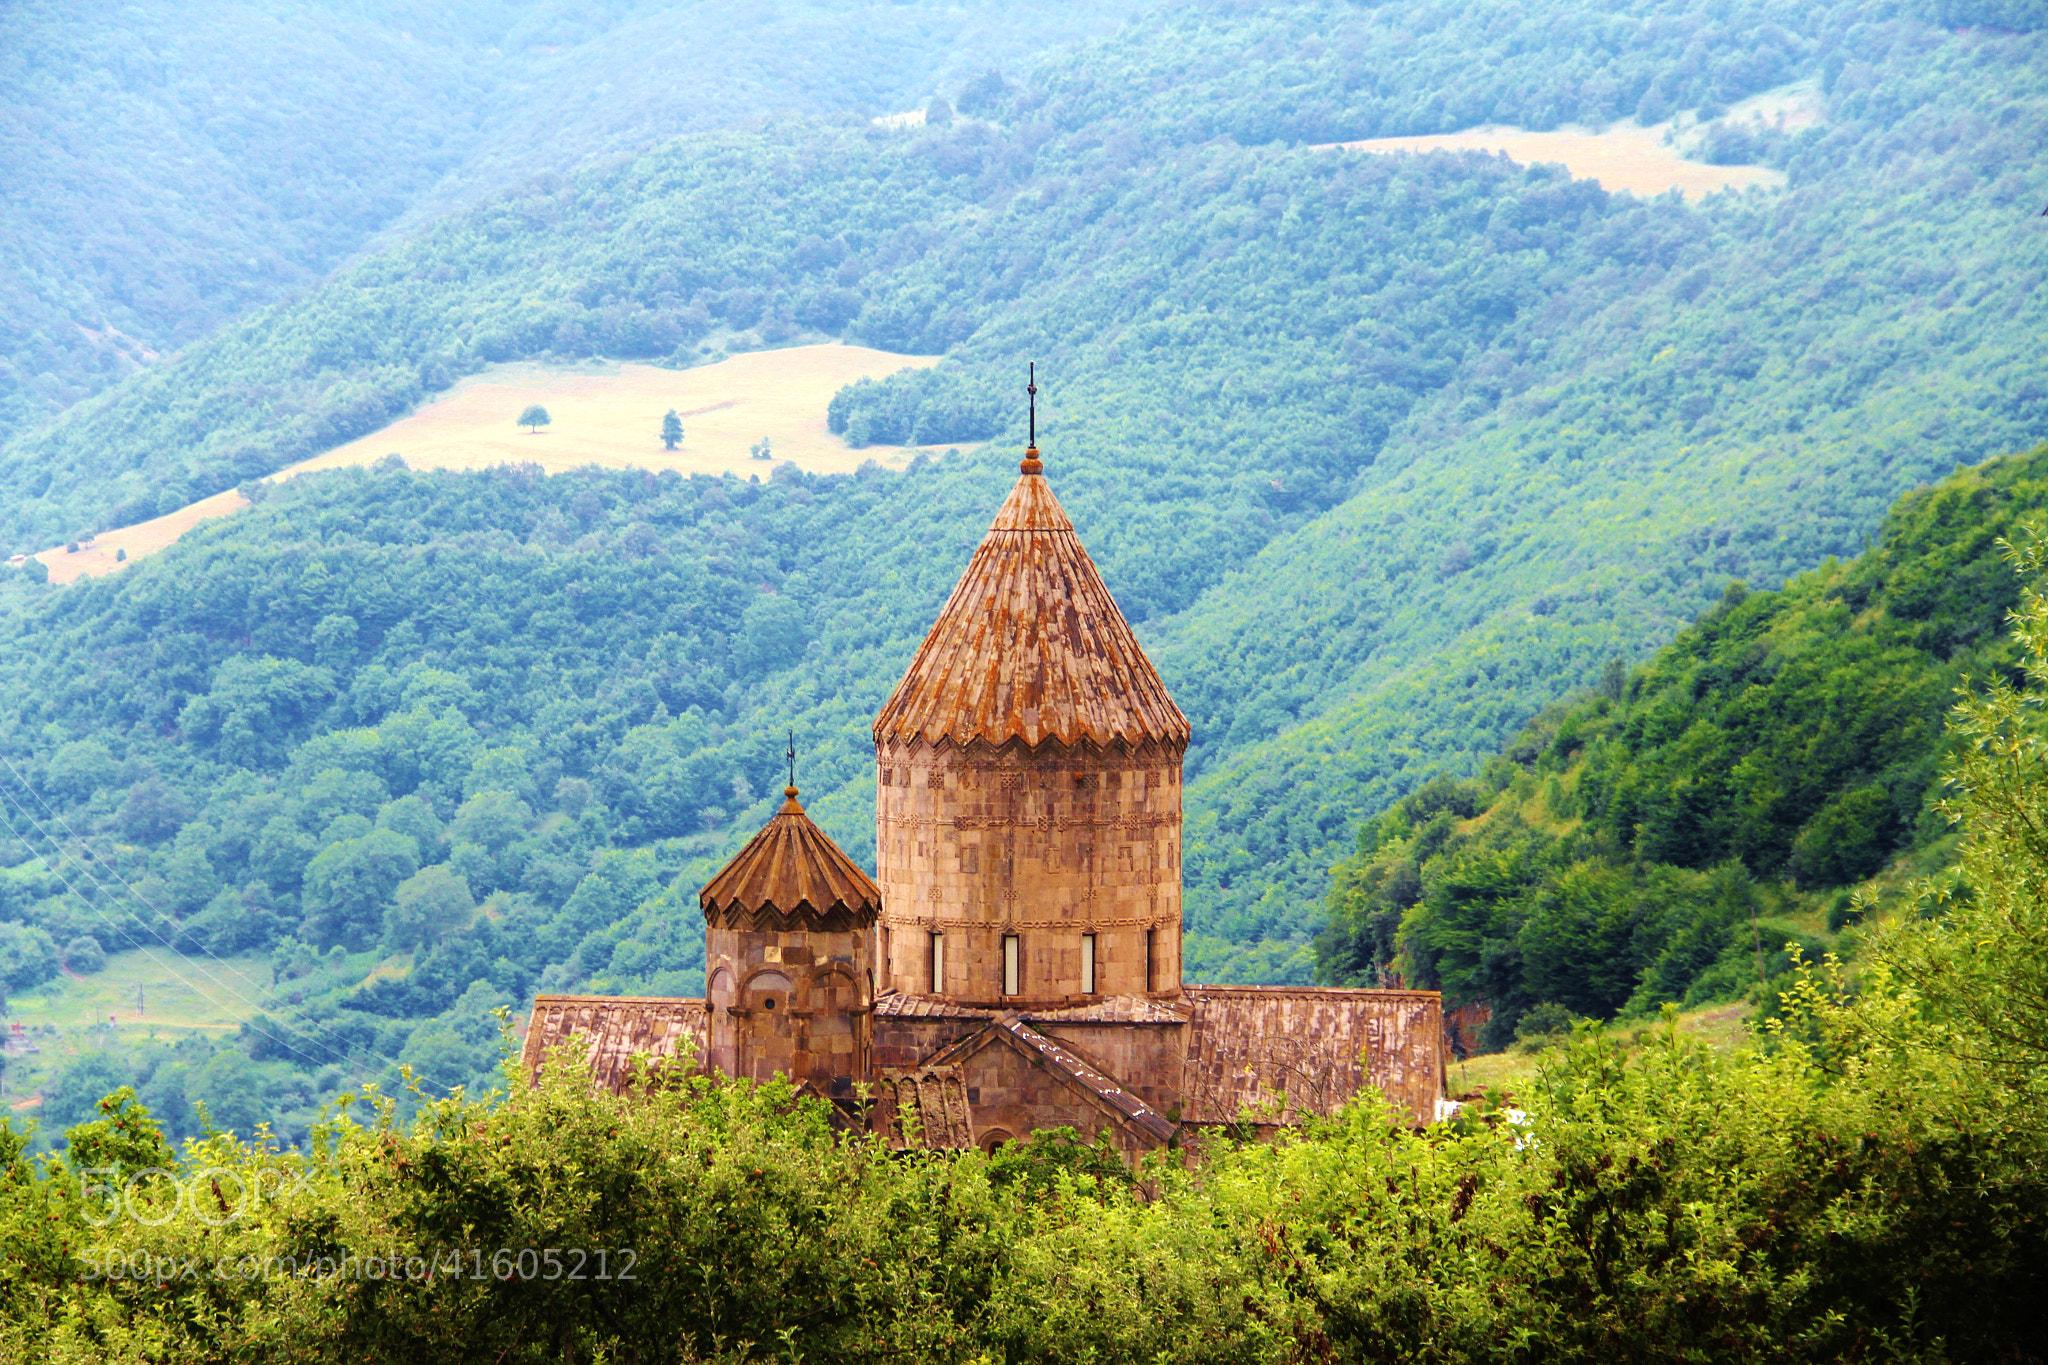 Photograph The Monastery of Tatev, Armenia by Armen Gh on 500px